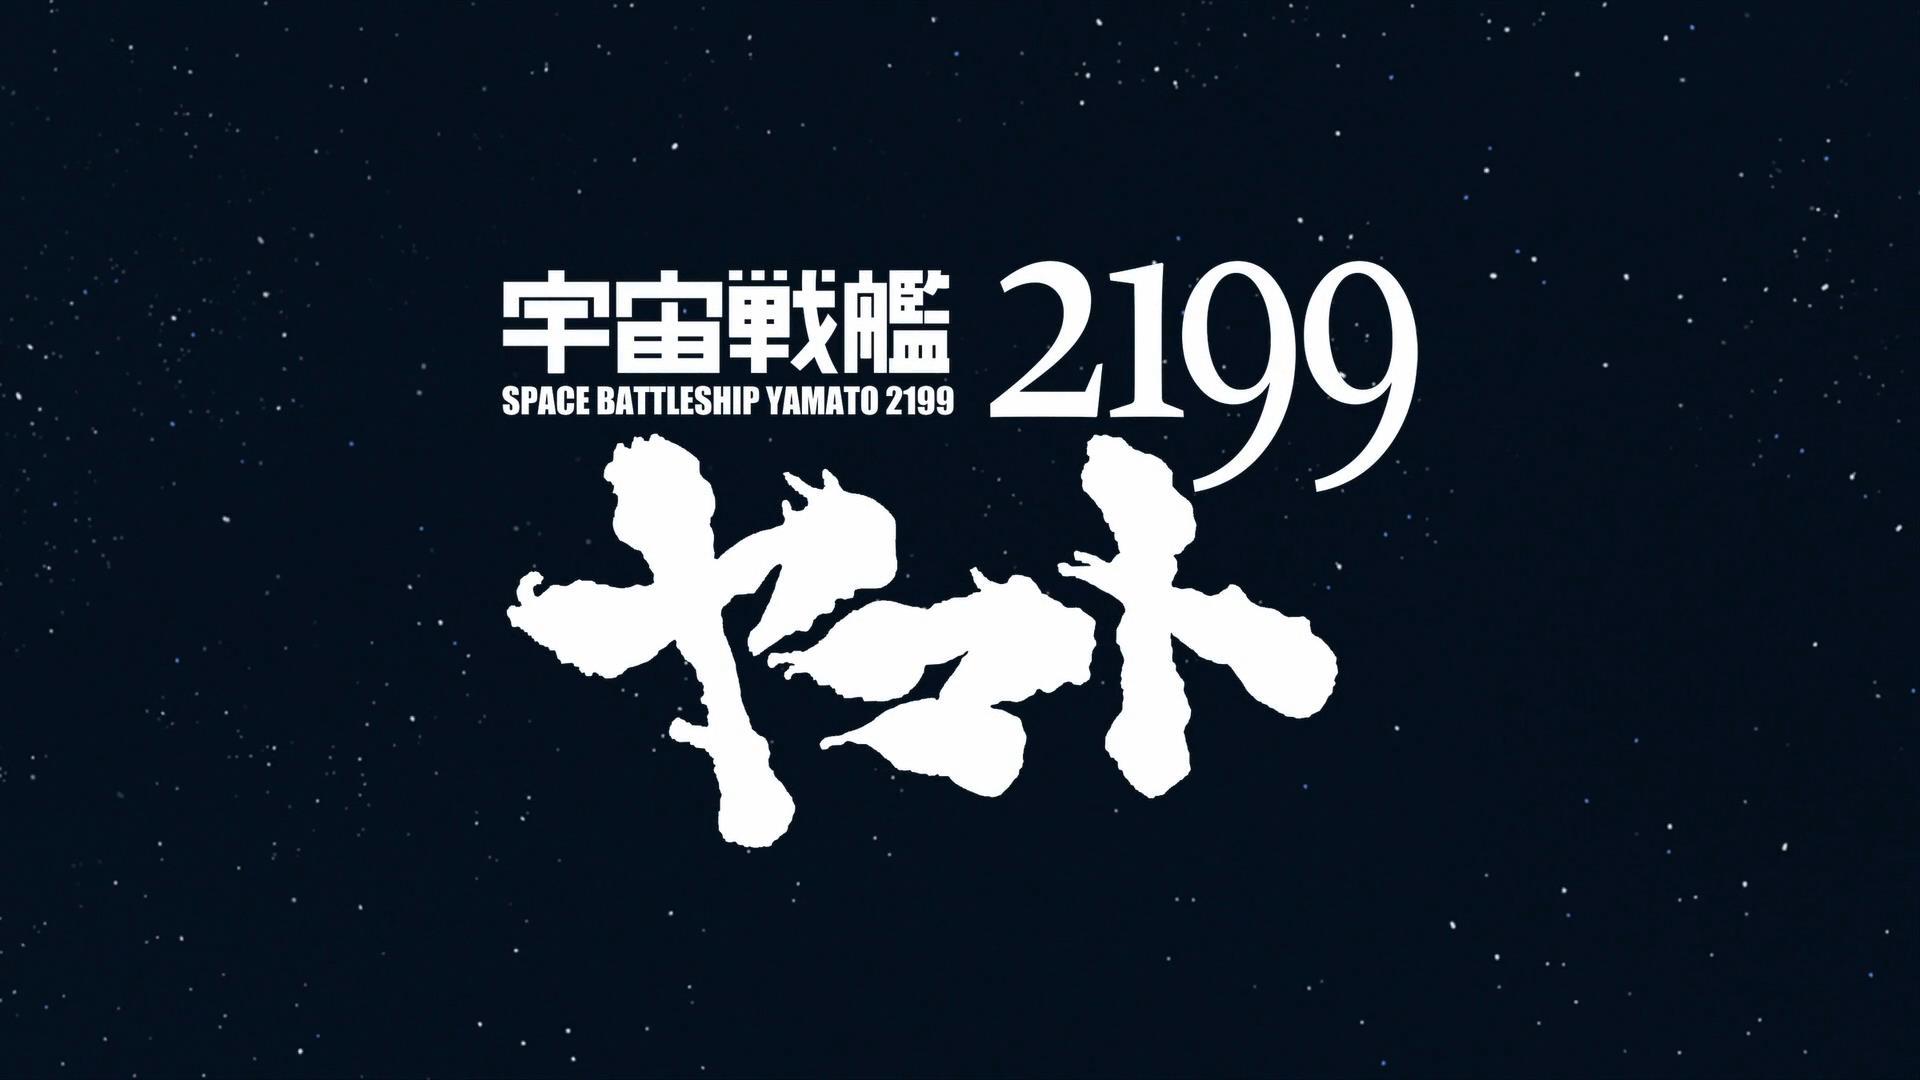 Space Battleship Yamato 2199 Episode 1 Wrong Every Time